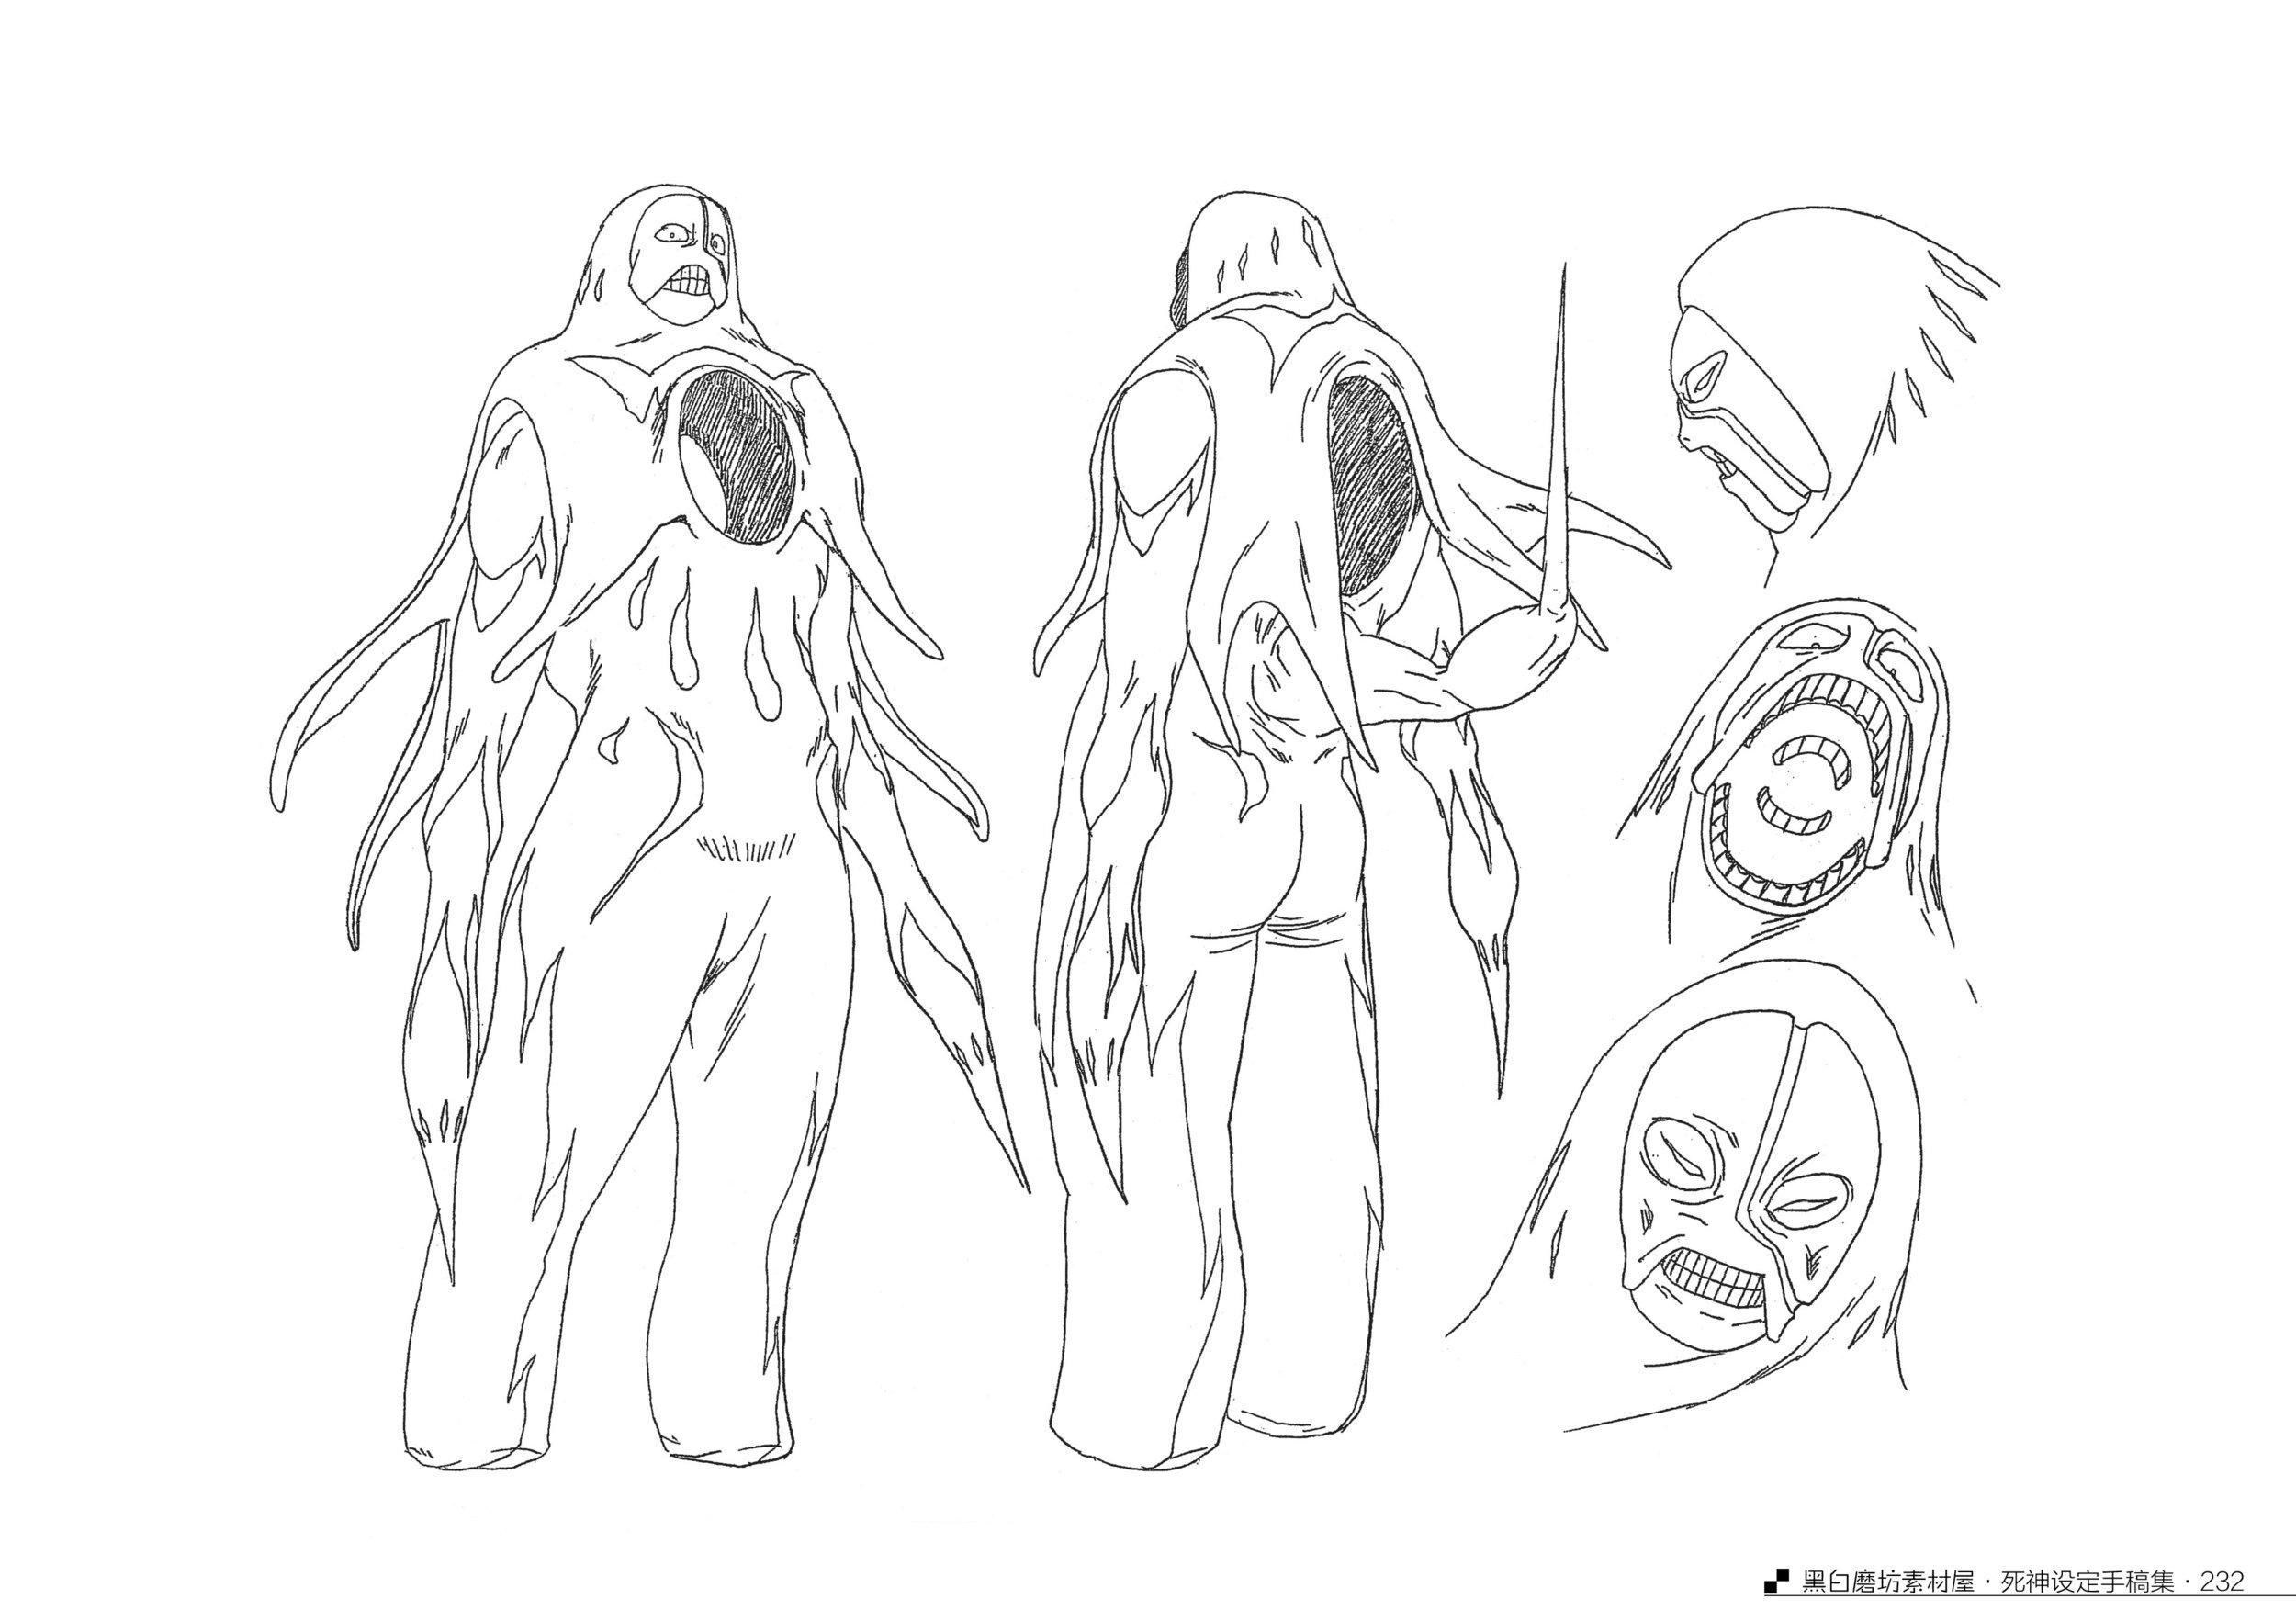 Art of the Bleach A - 210.jpg